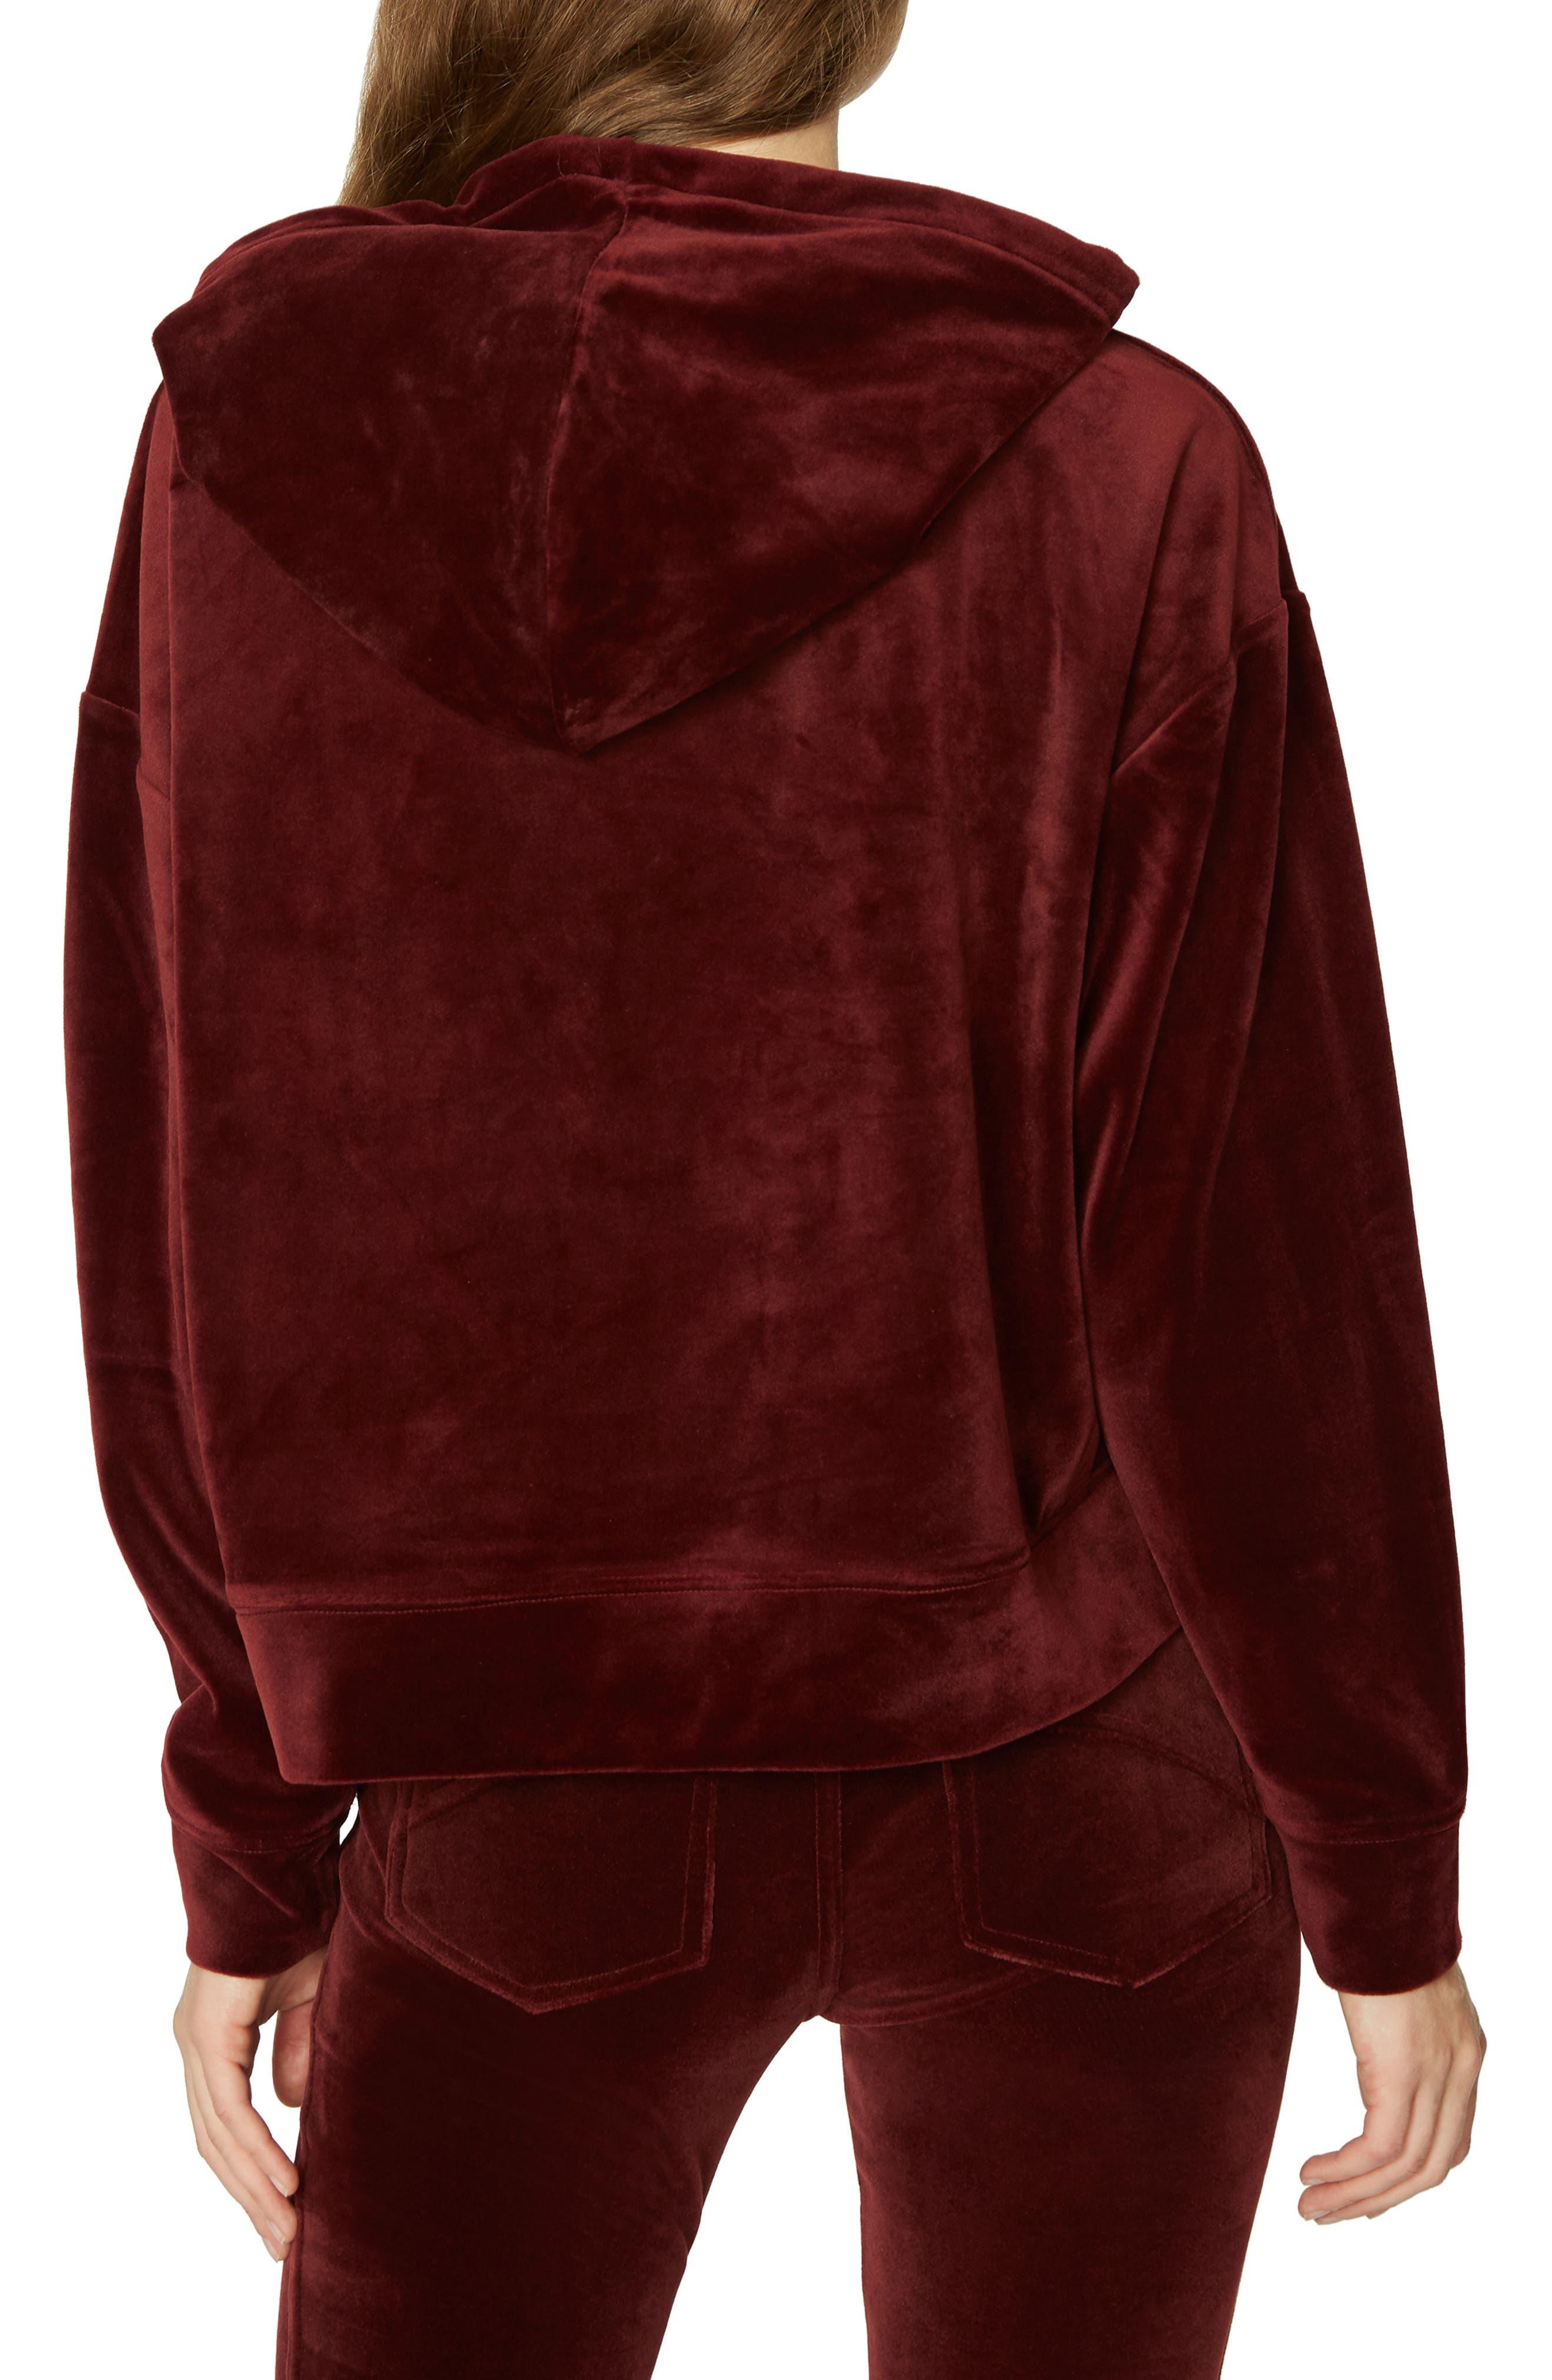 SANCTUARY,                             Melrose Brigade Velour Hoodie Sweater,                             Alternate thumbnail 2, color,                             602